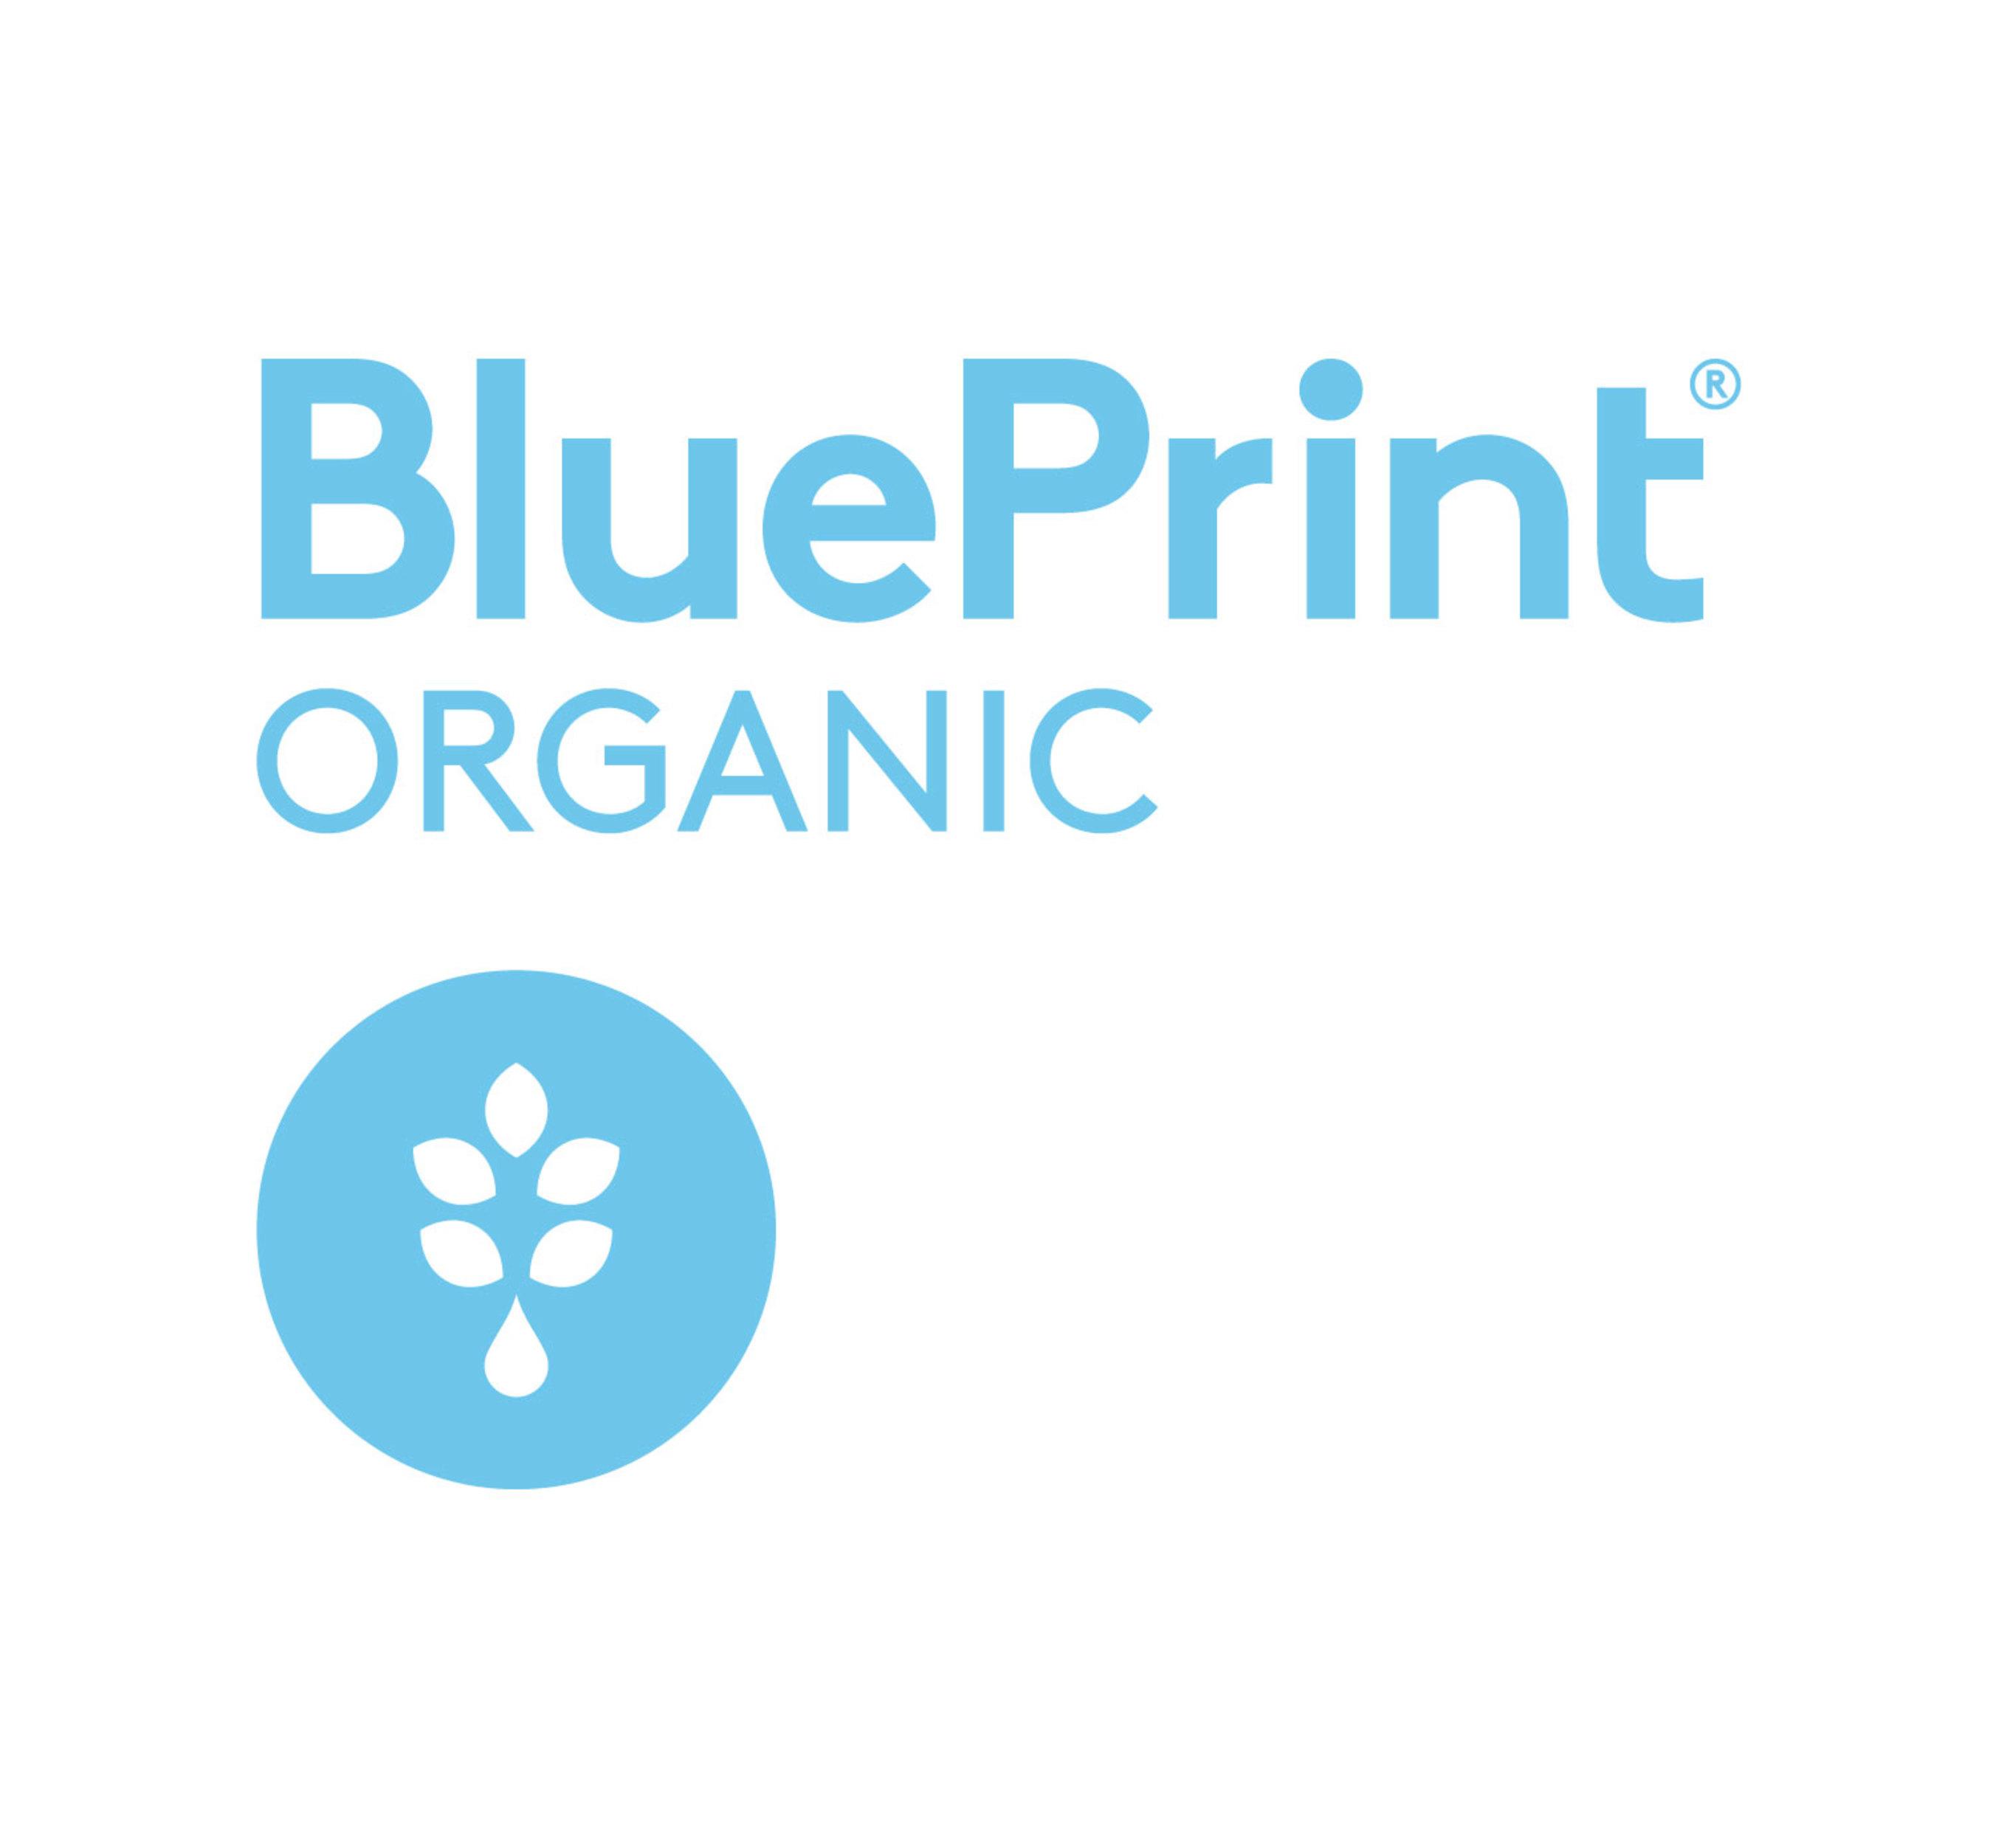 Blueprint organic adds innovative line of tea infused energy drinks blueprint organic adds innovative line of tea infused energy drinks to growing beverage line malvernweather Gallery